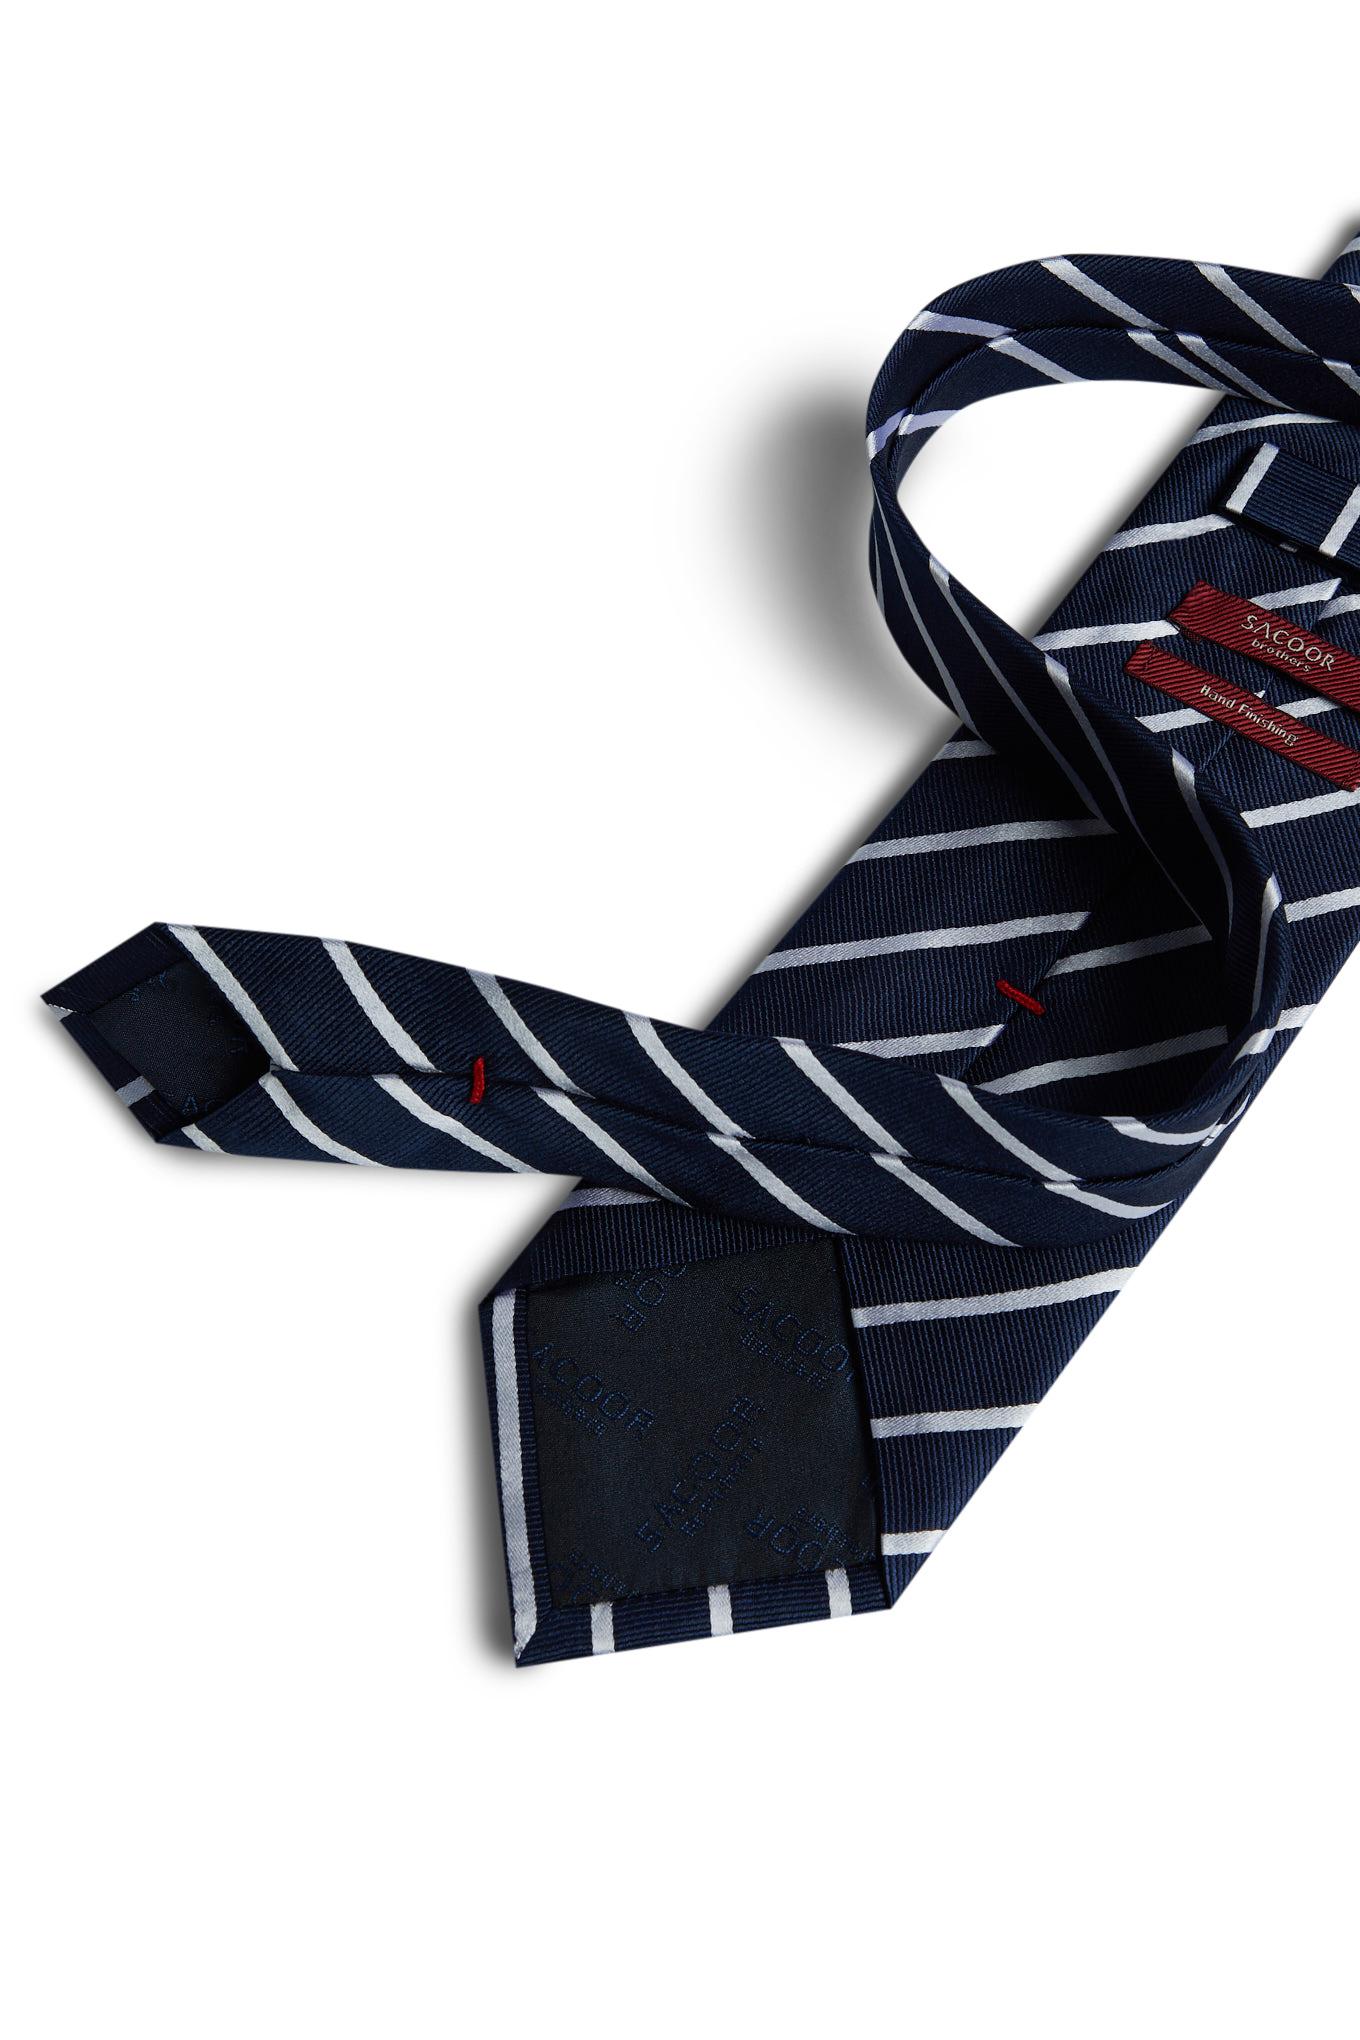 Gravata Azul Escuro Formal Homem